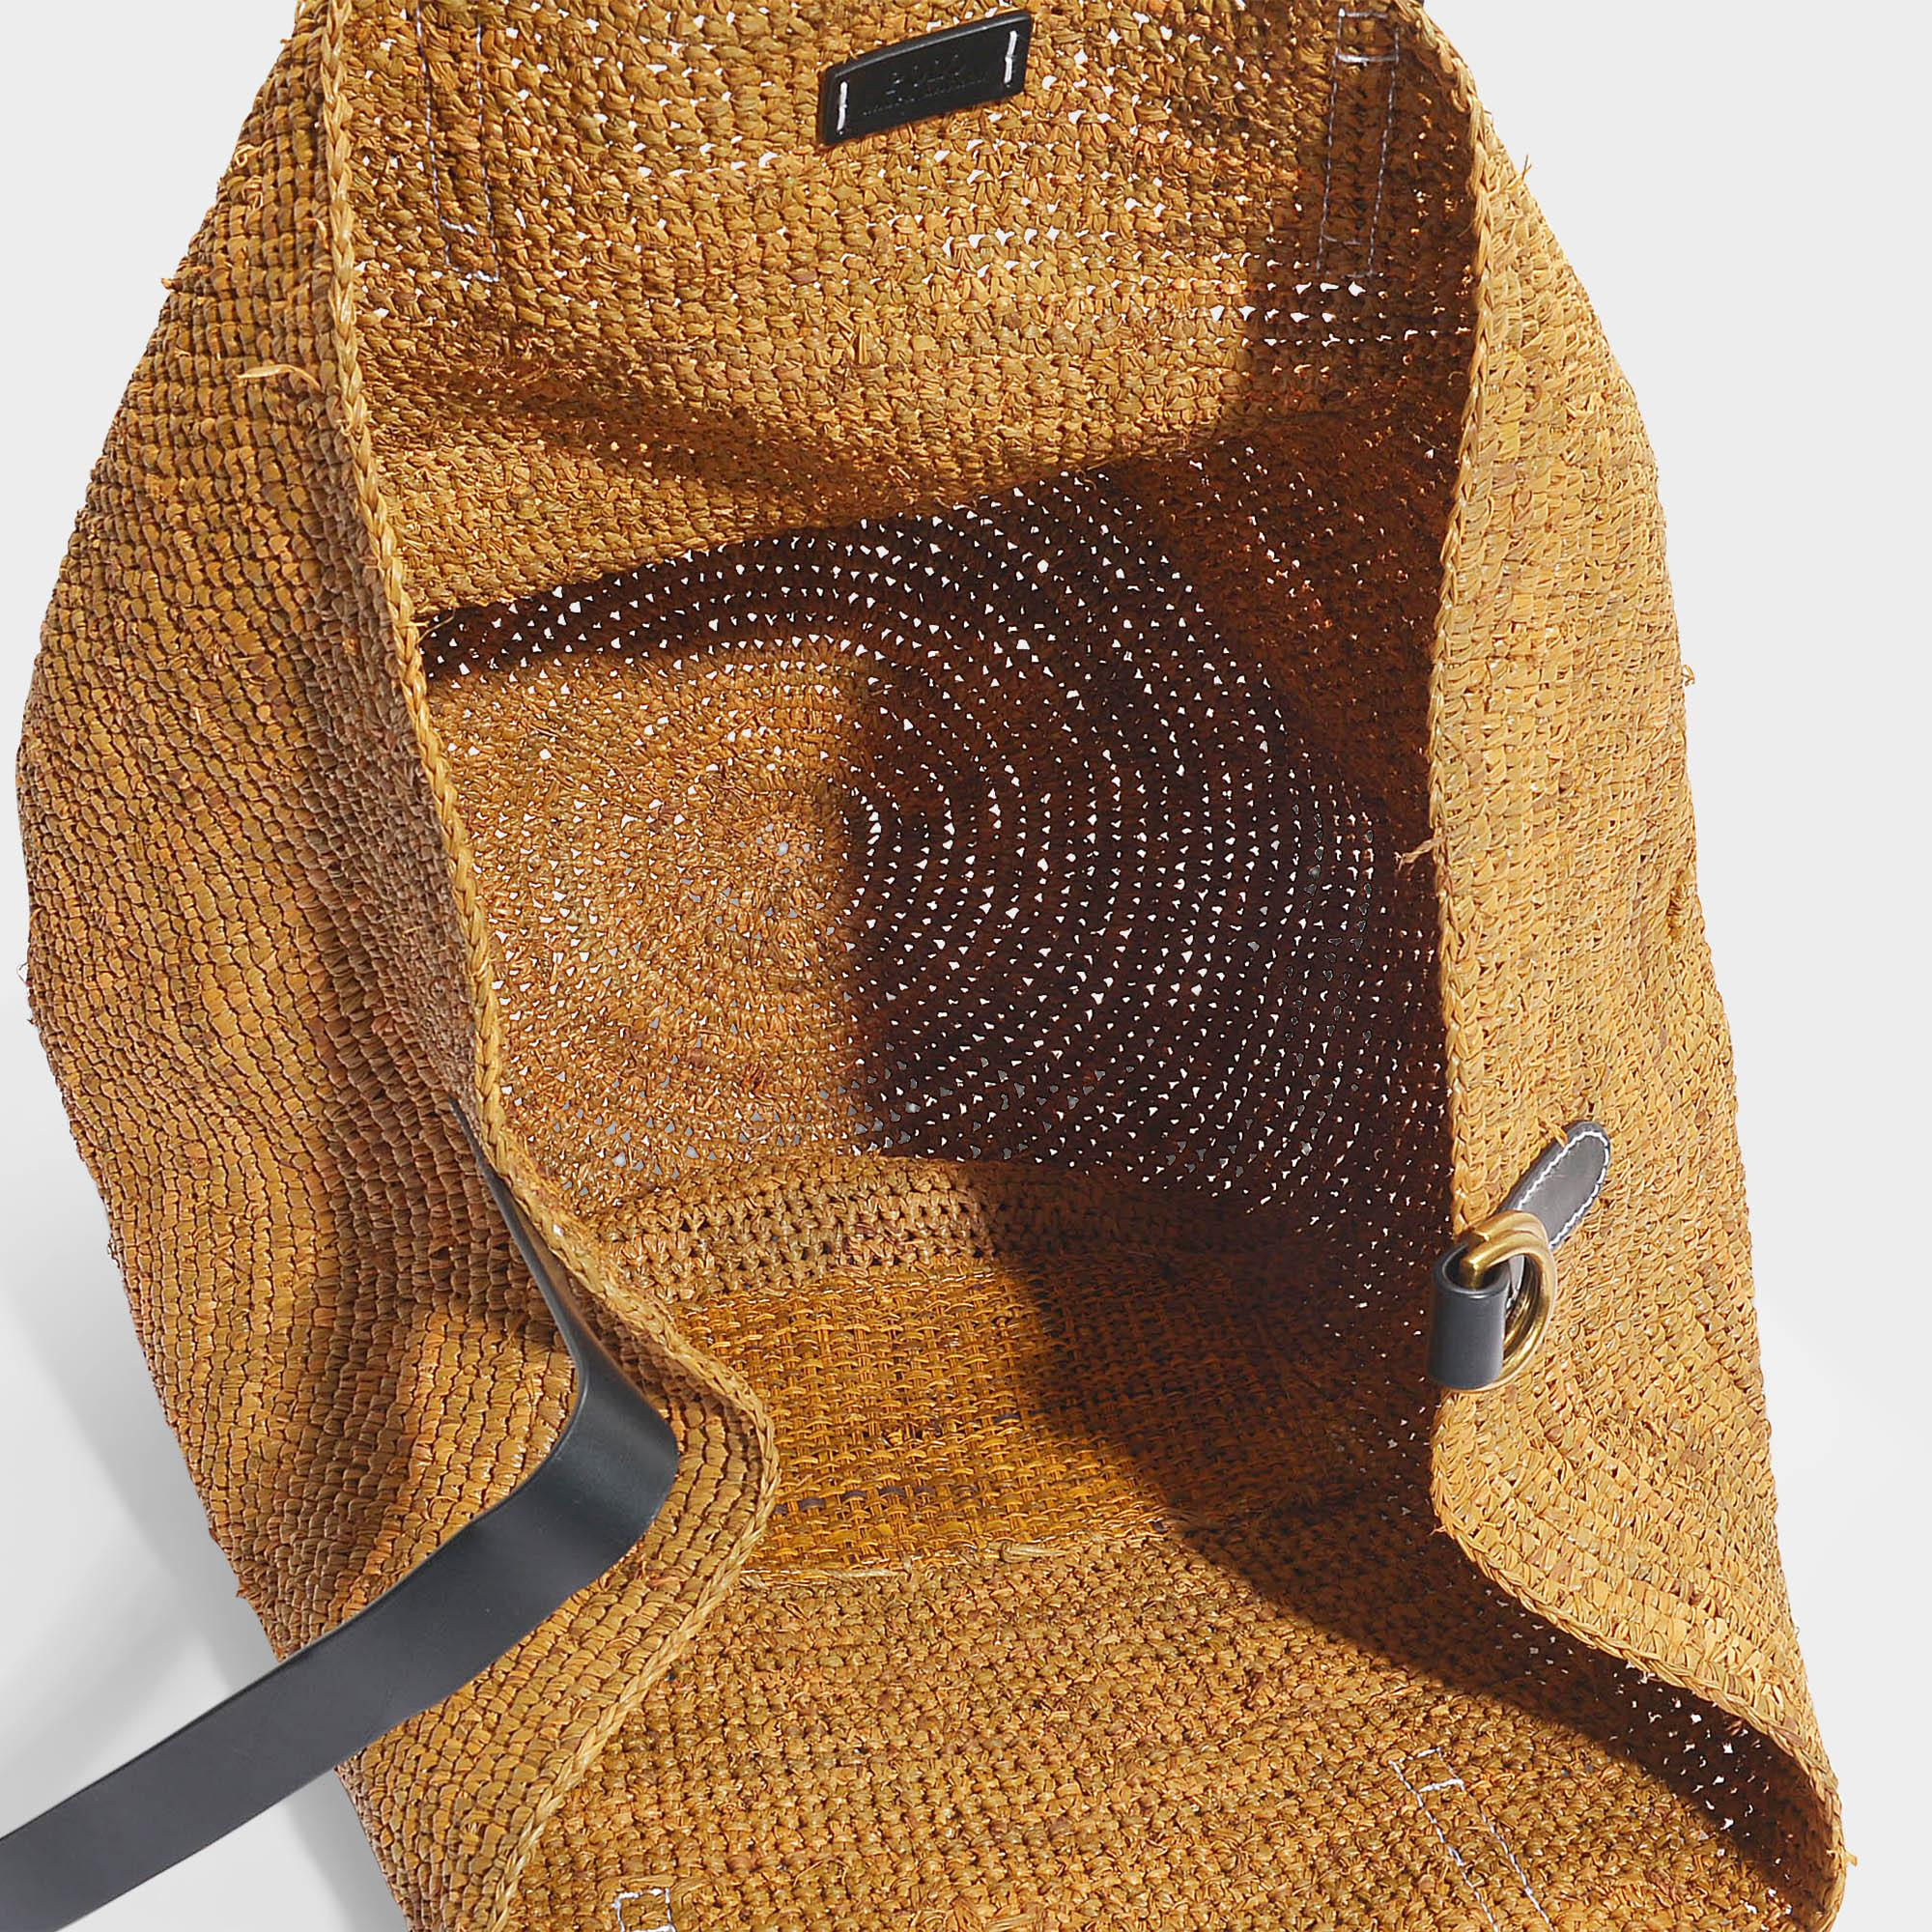 Coloris Raphia Brown Beige En Polo Cabas Raffia Ralph Lauren 7bgyf6